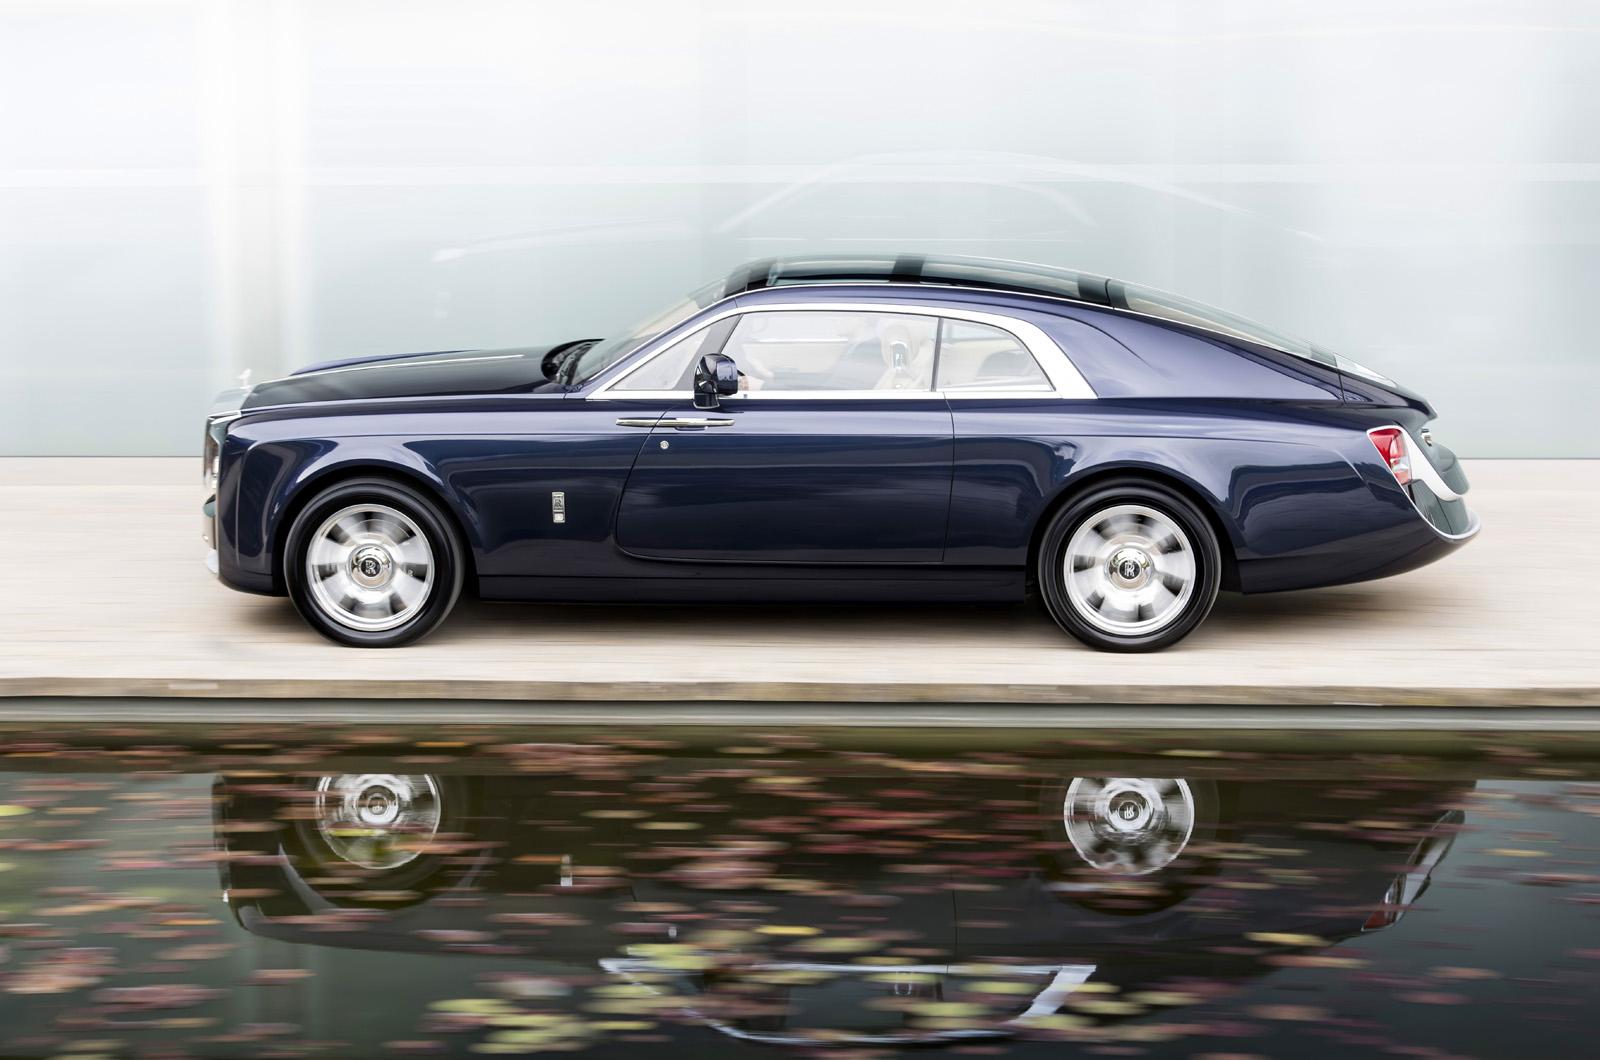 Rolls-Royce открывает эксклюзивный заказ «Sweepail»